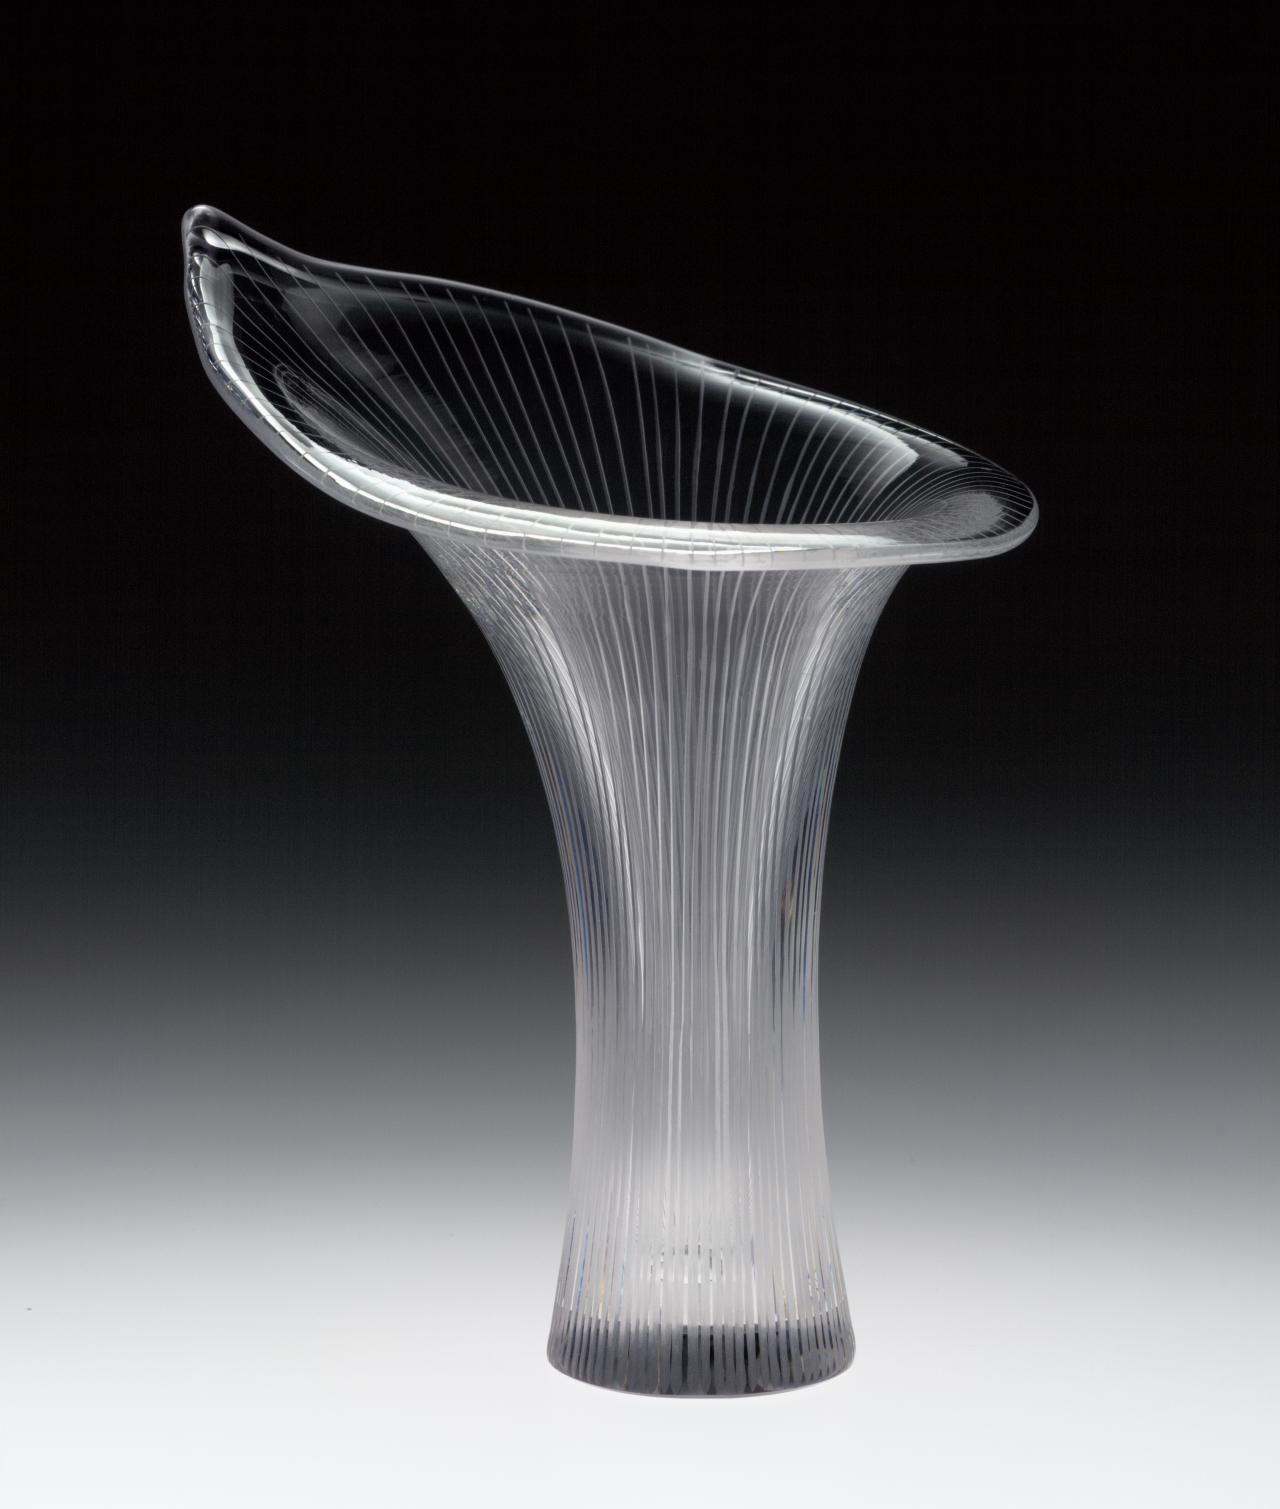 Nordic Cool Modernist Design Ngv